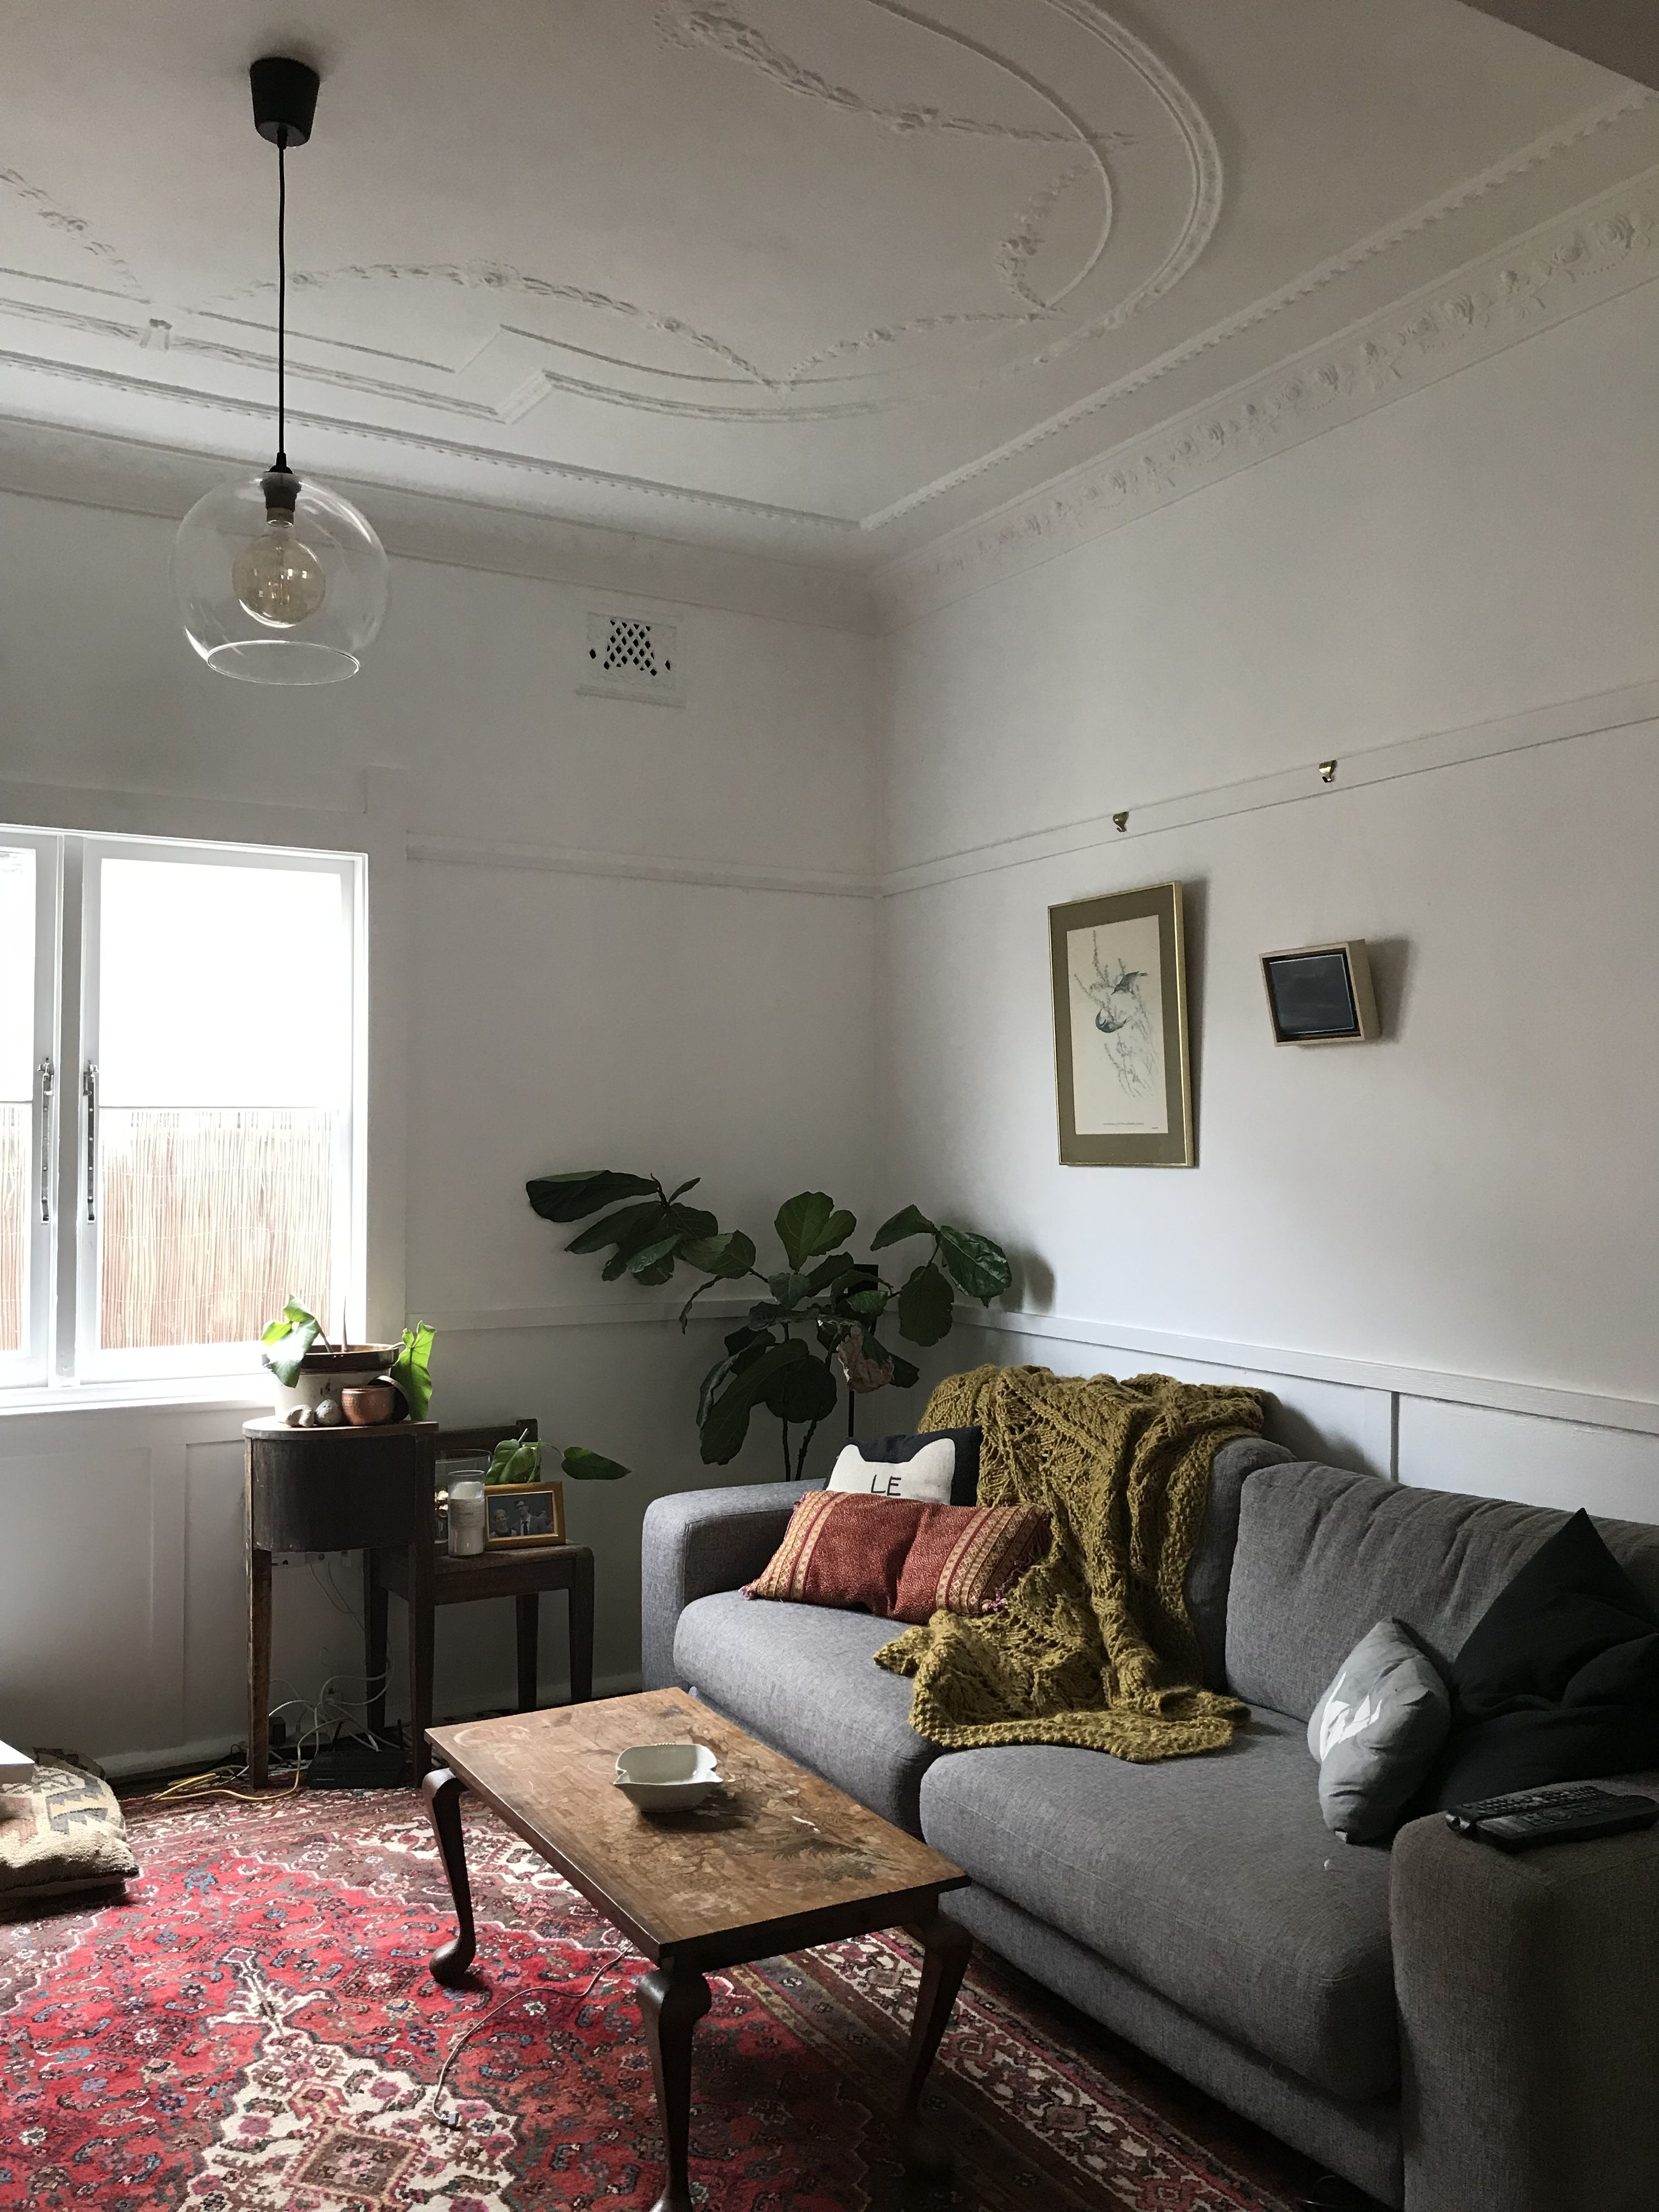 Pin de Hannah Lara en Live here | Pinterest | Ideas hogar, Salón y Hogar